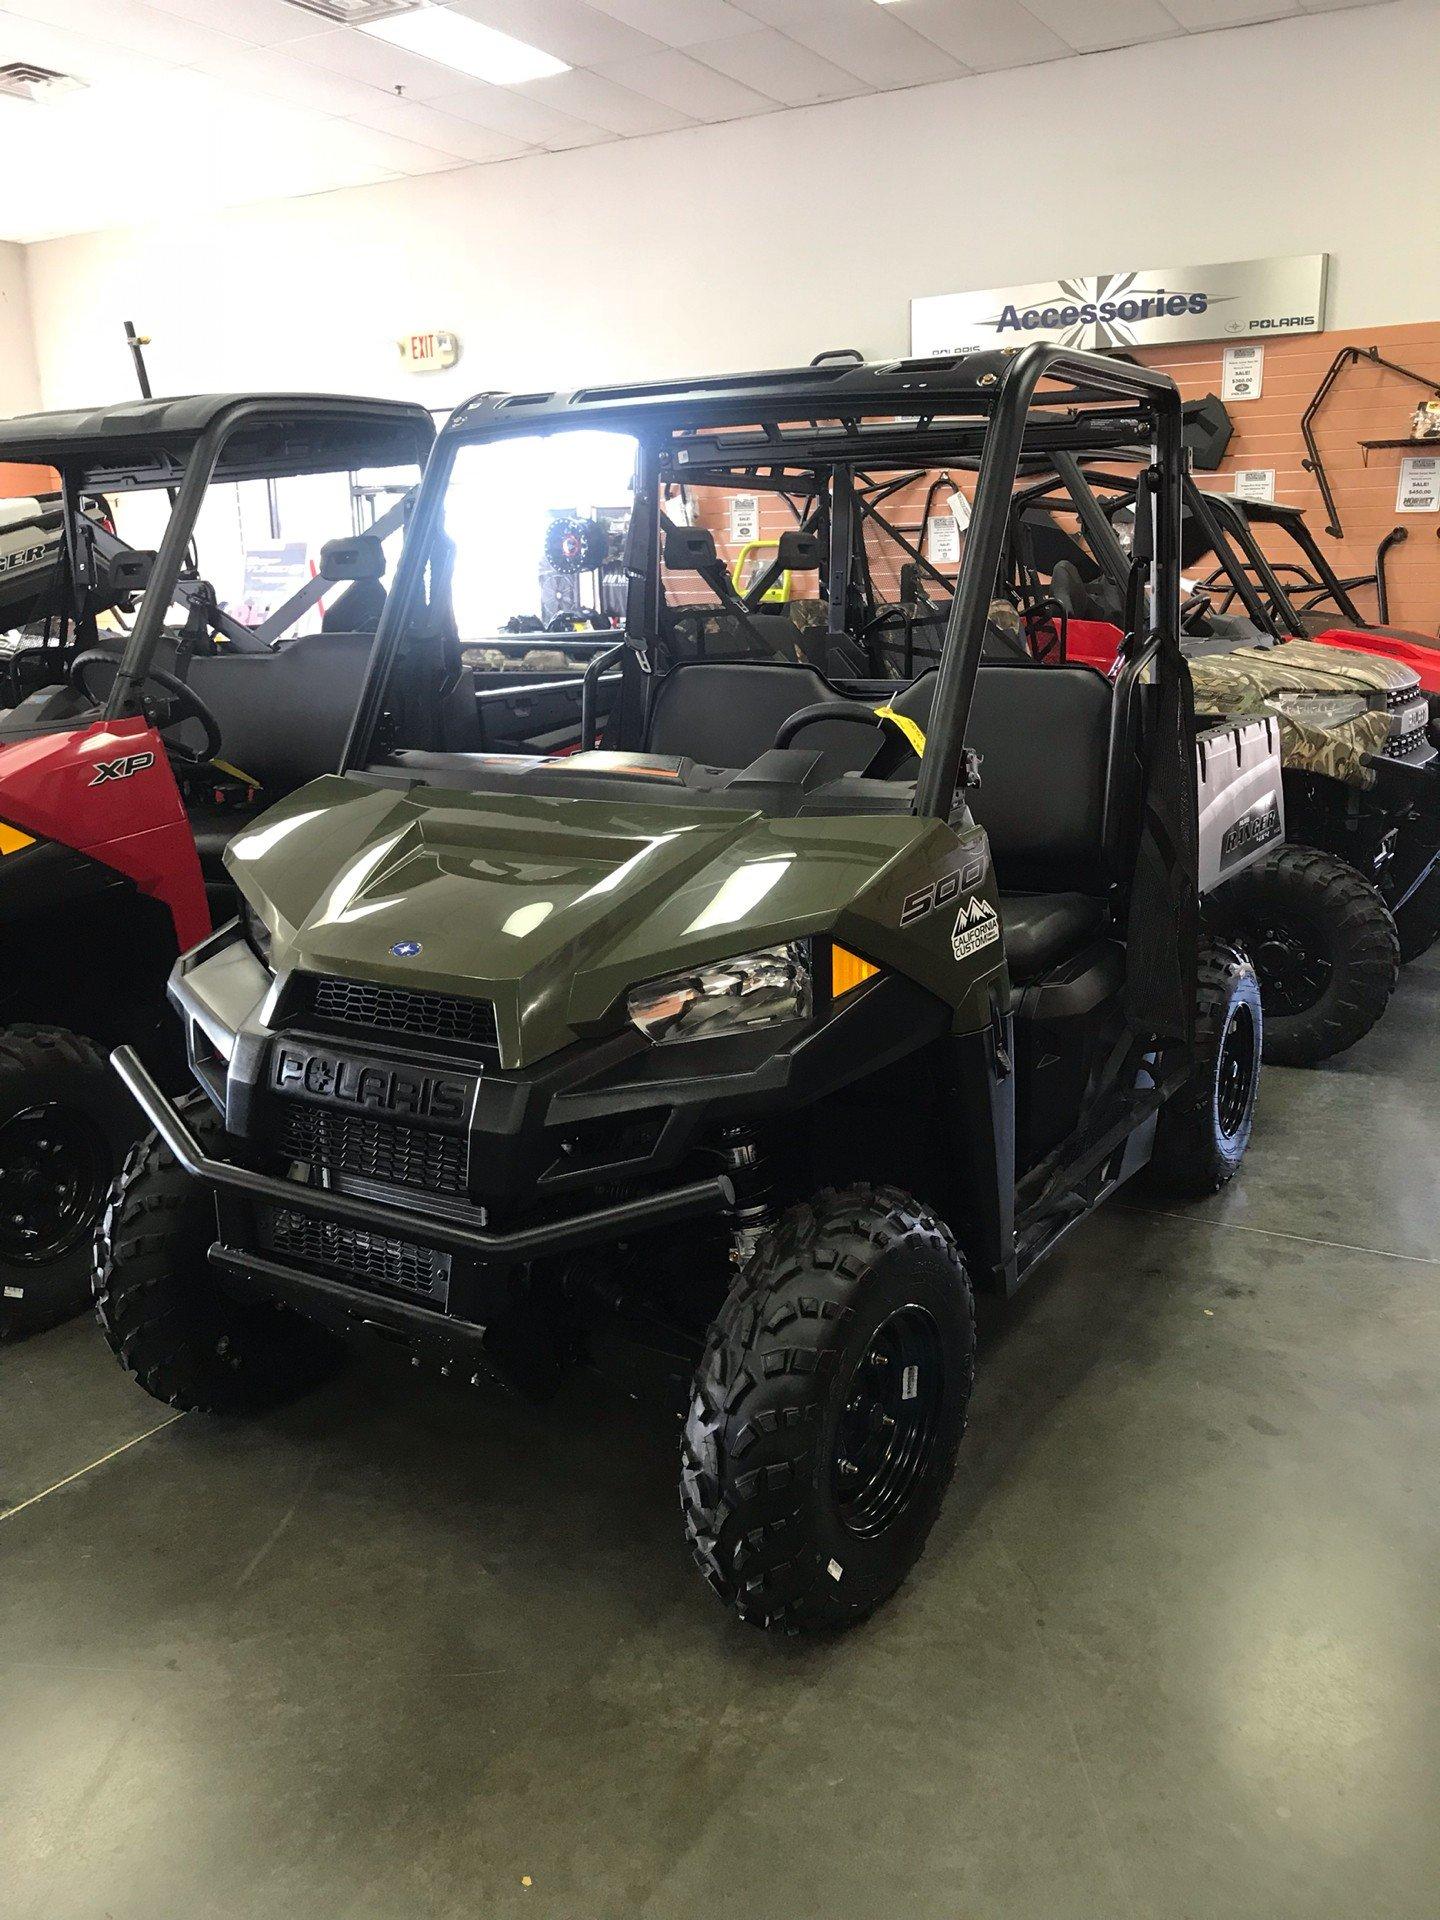 2019 Polaris Ranger 500 for sale 93730